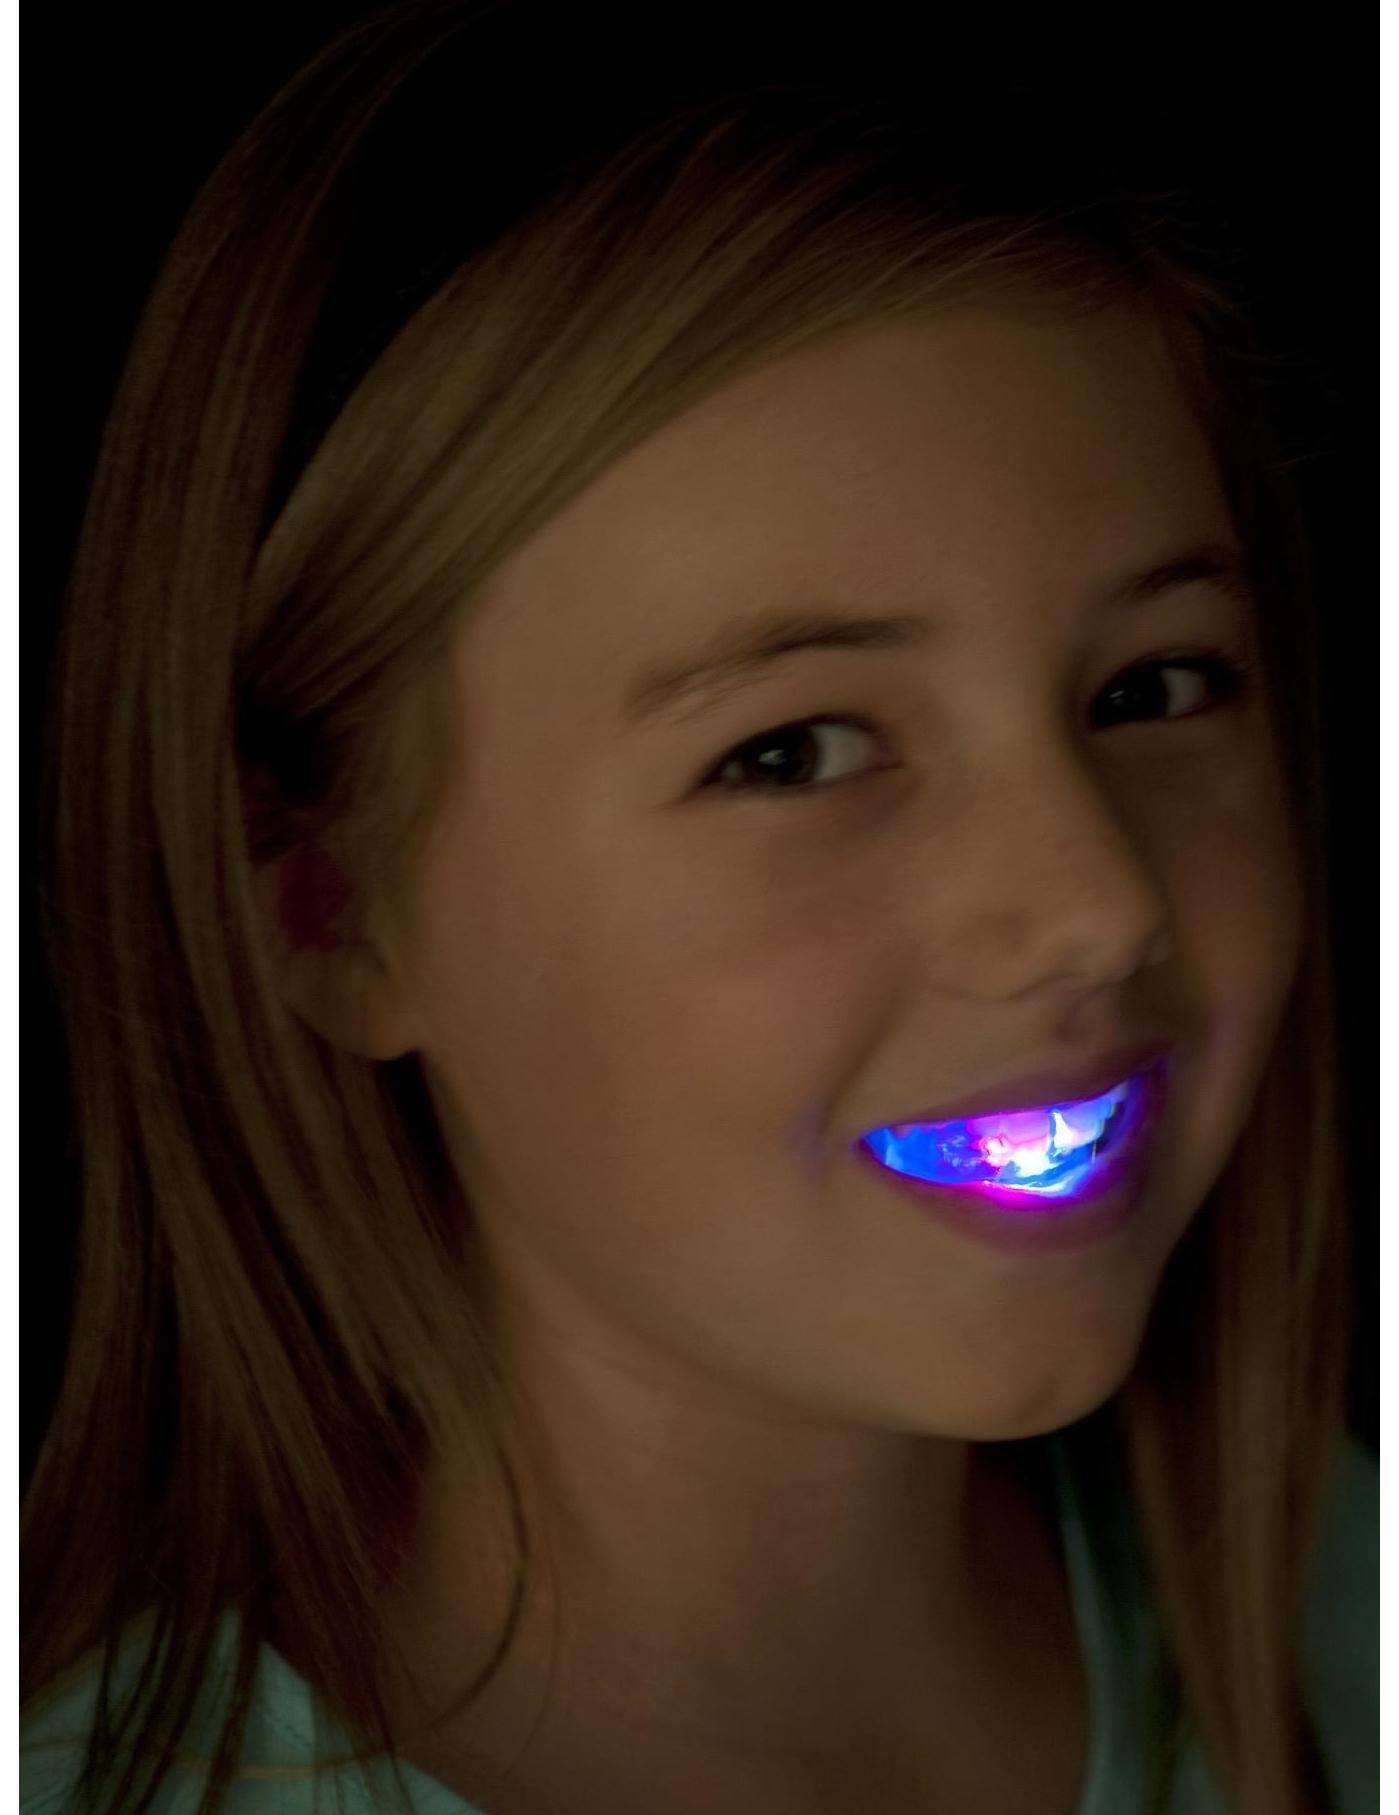 Dentiera luminosa con LED 5dfecb83399f